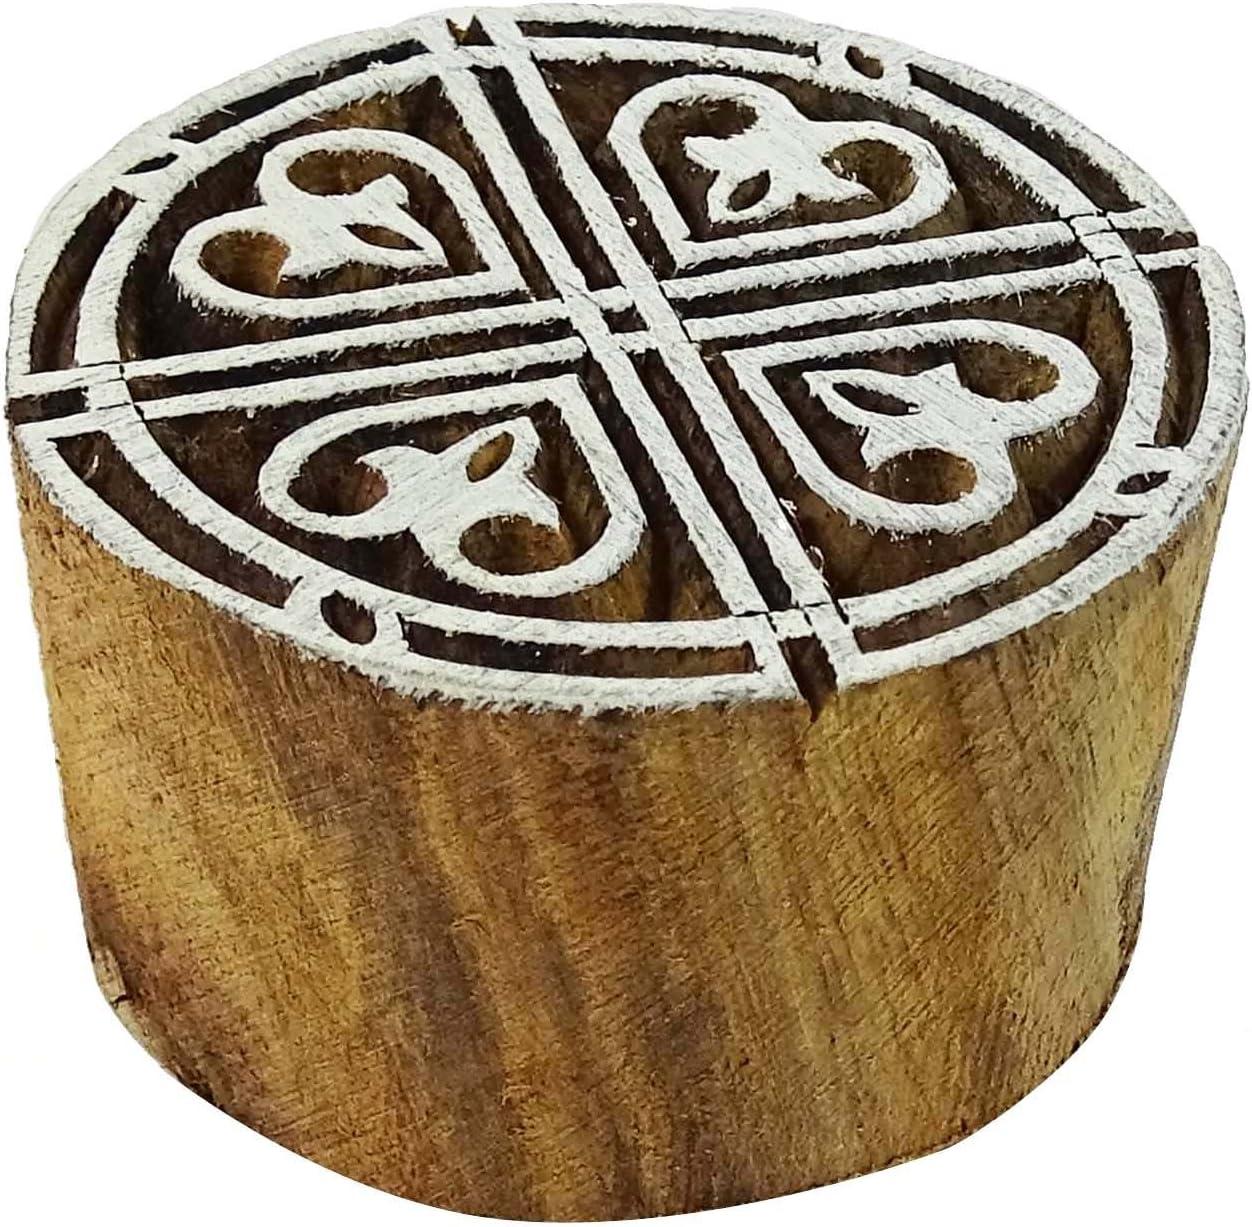 Knitwit Indian Holz Stempel Herz Stempel Braun Textildruck Block Dekorative Bl/öcke